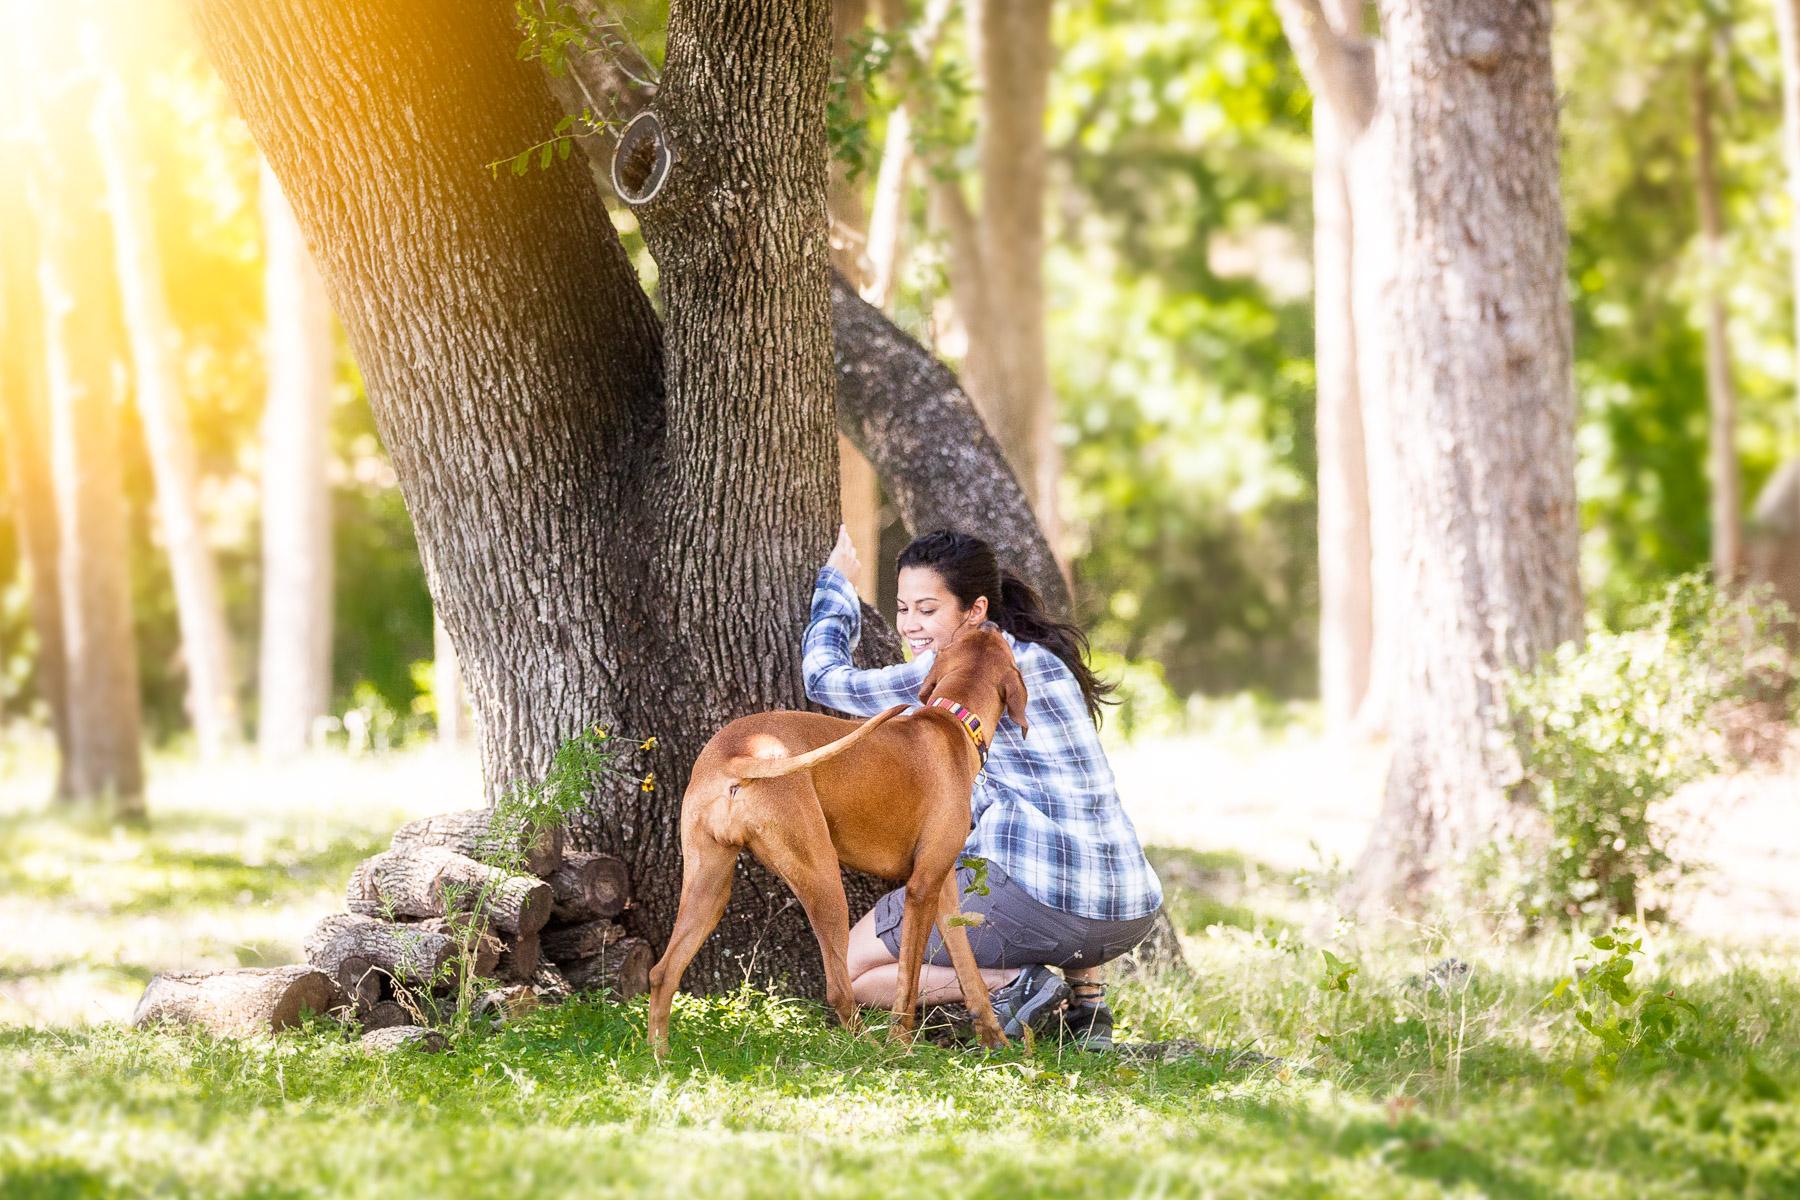 girl-playing-hide-seek-with-dog.jpg